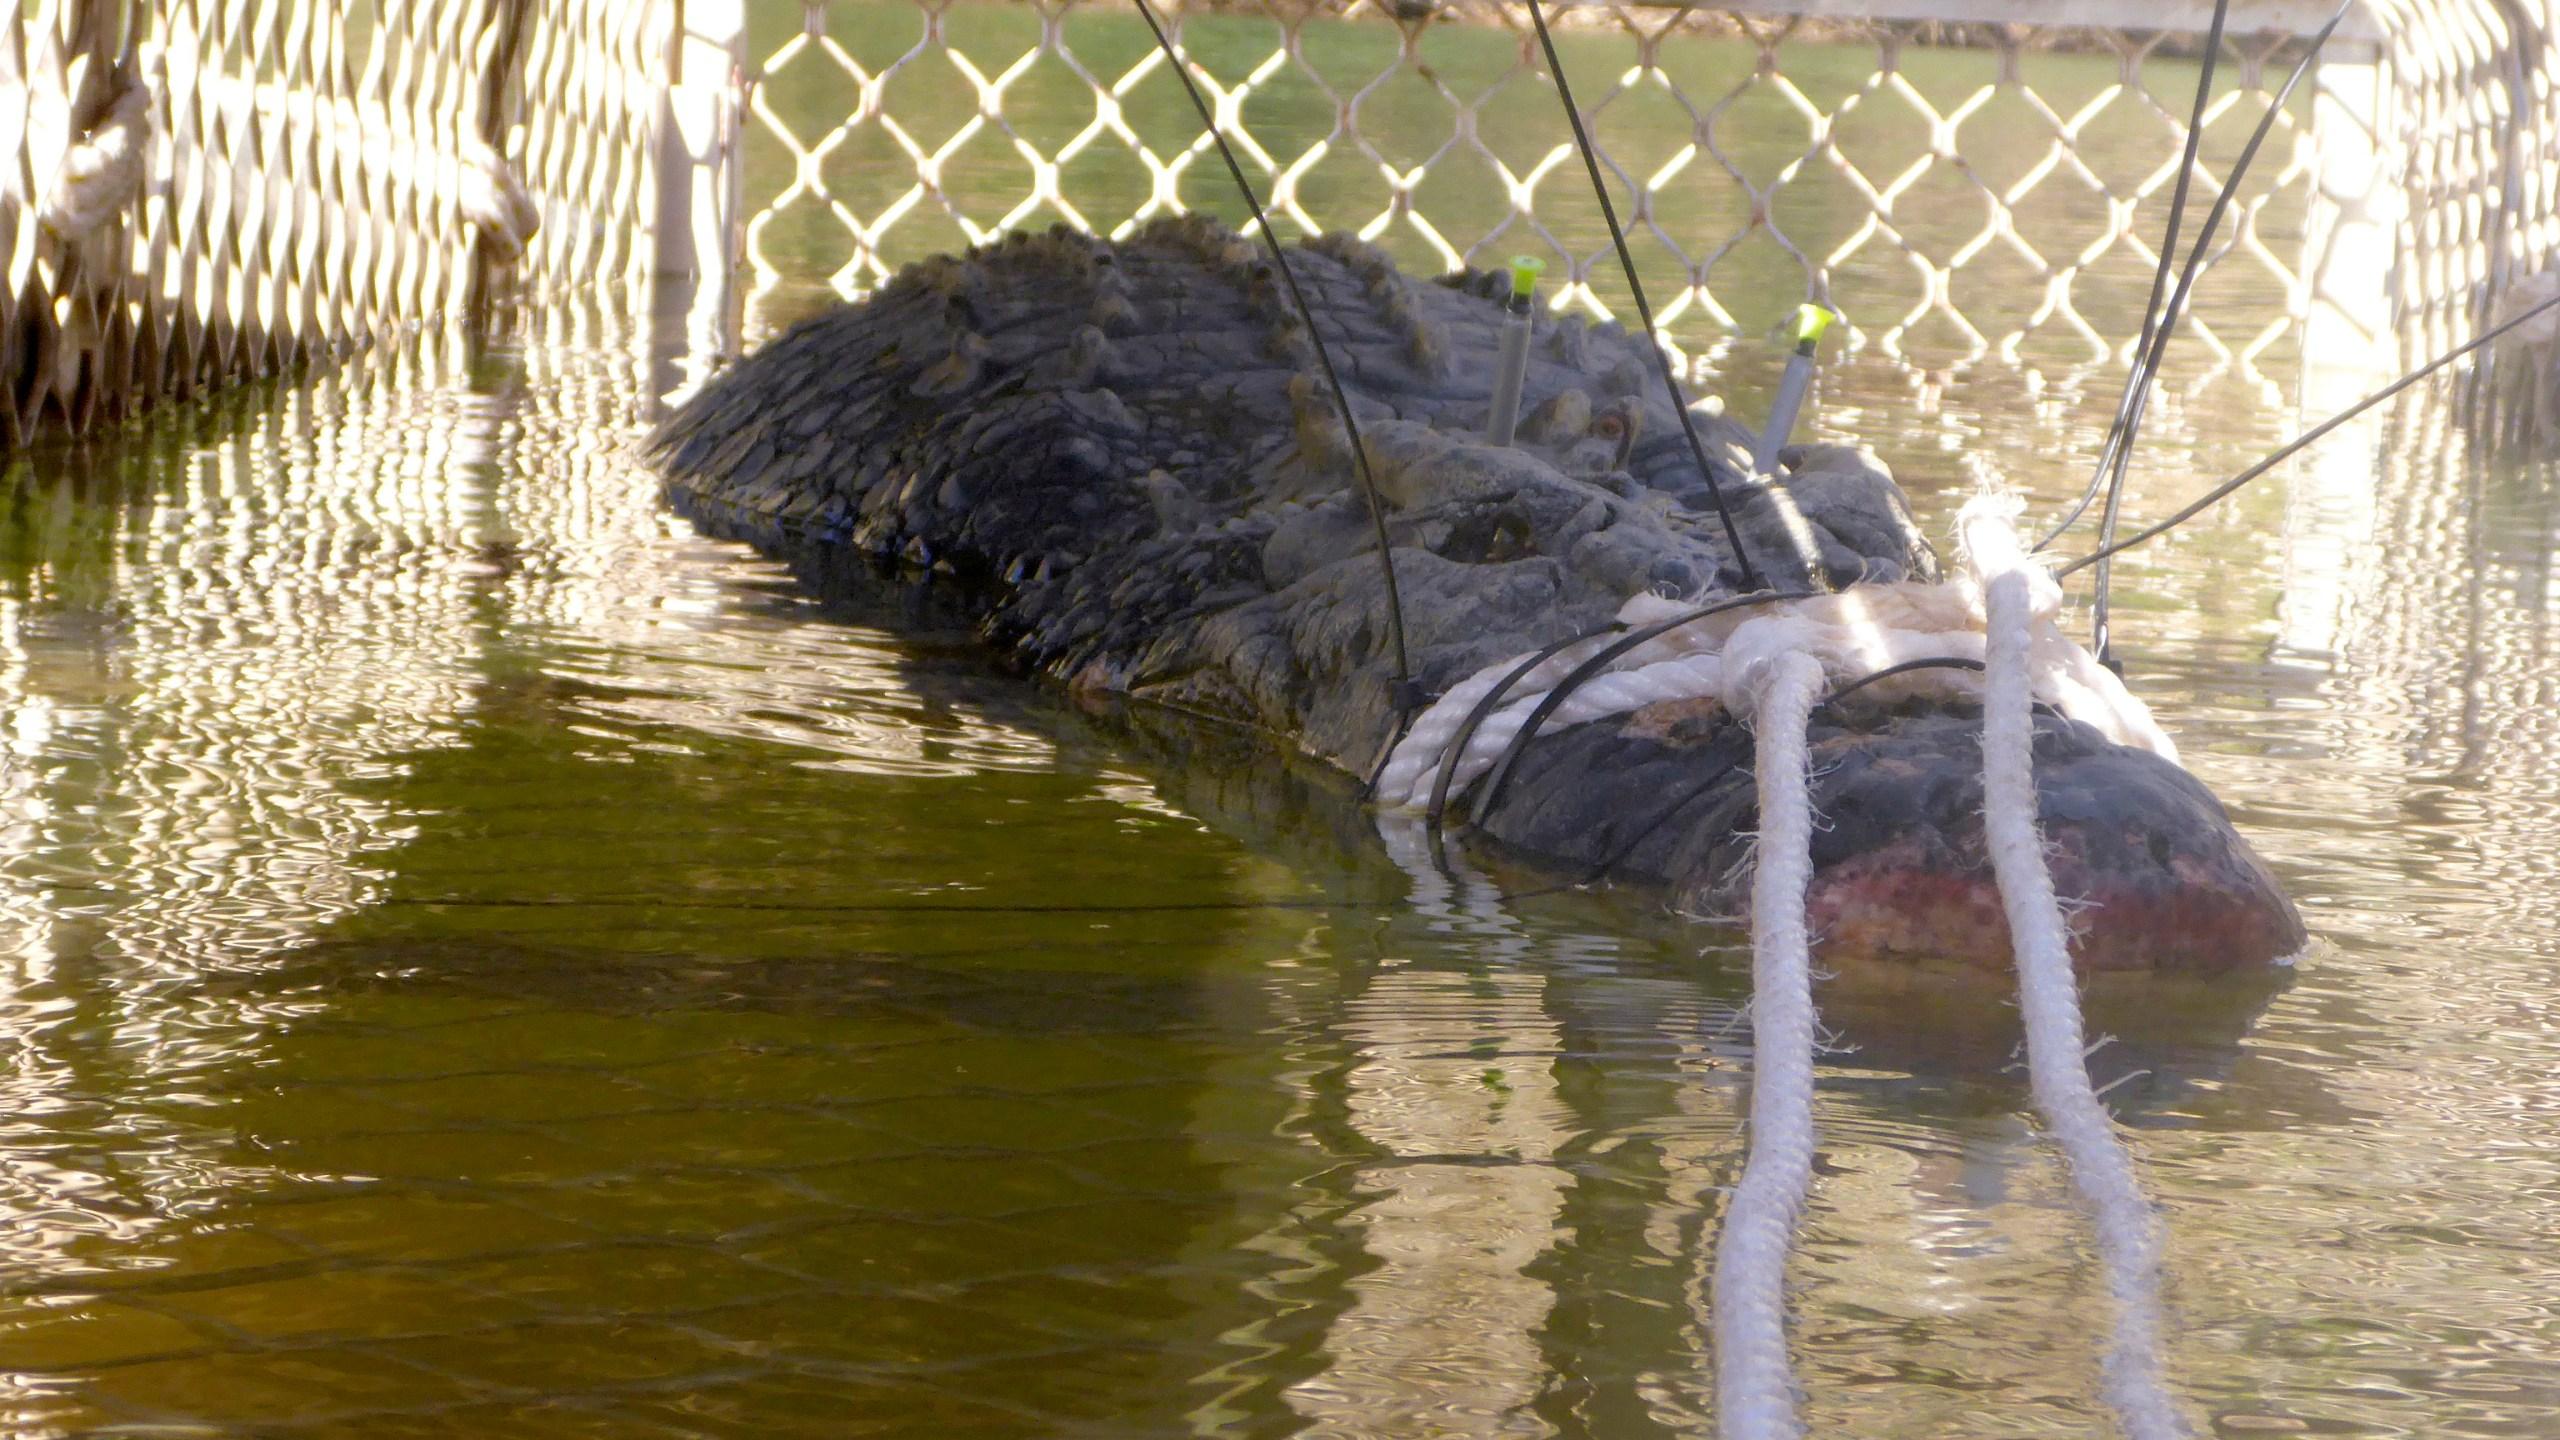 Australia_Crocodile_33782-159532.jpg16811802